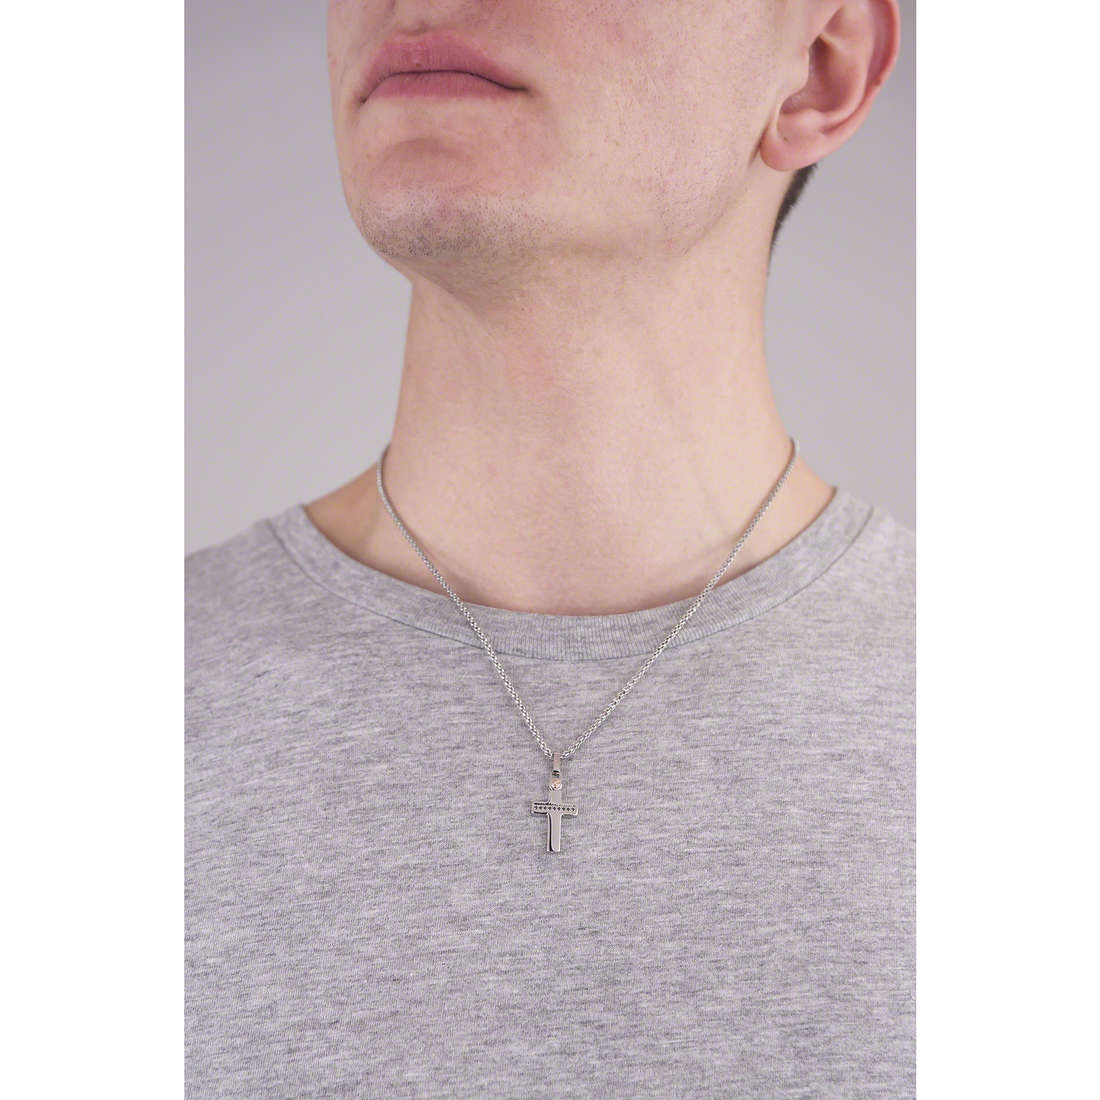 Comete necklaces Zip man UGL 521 indosso